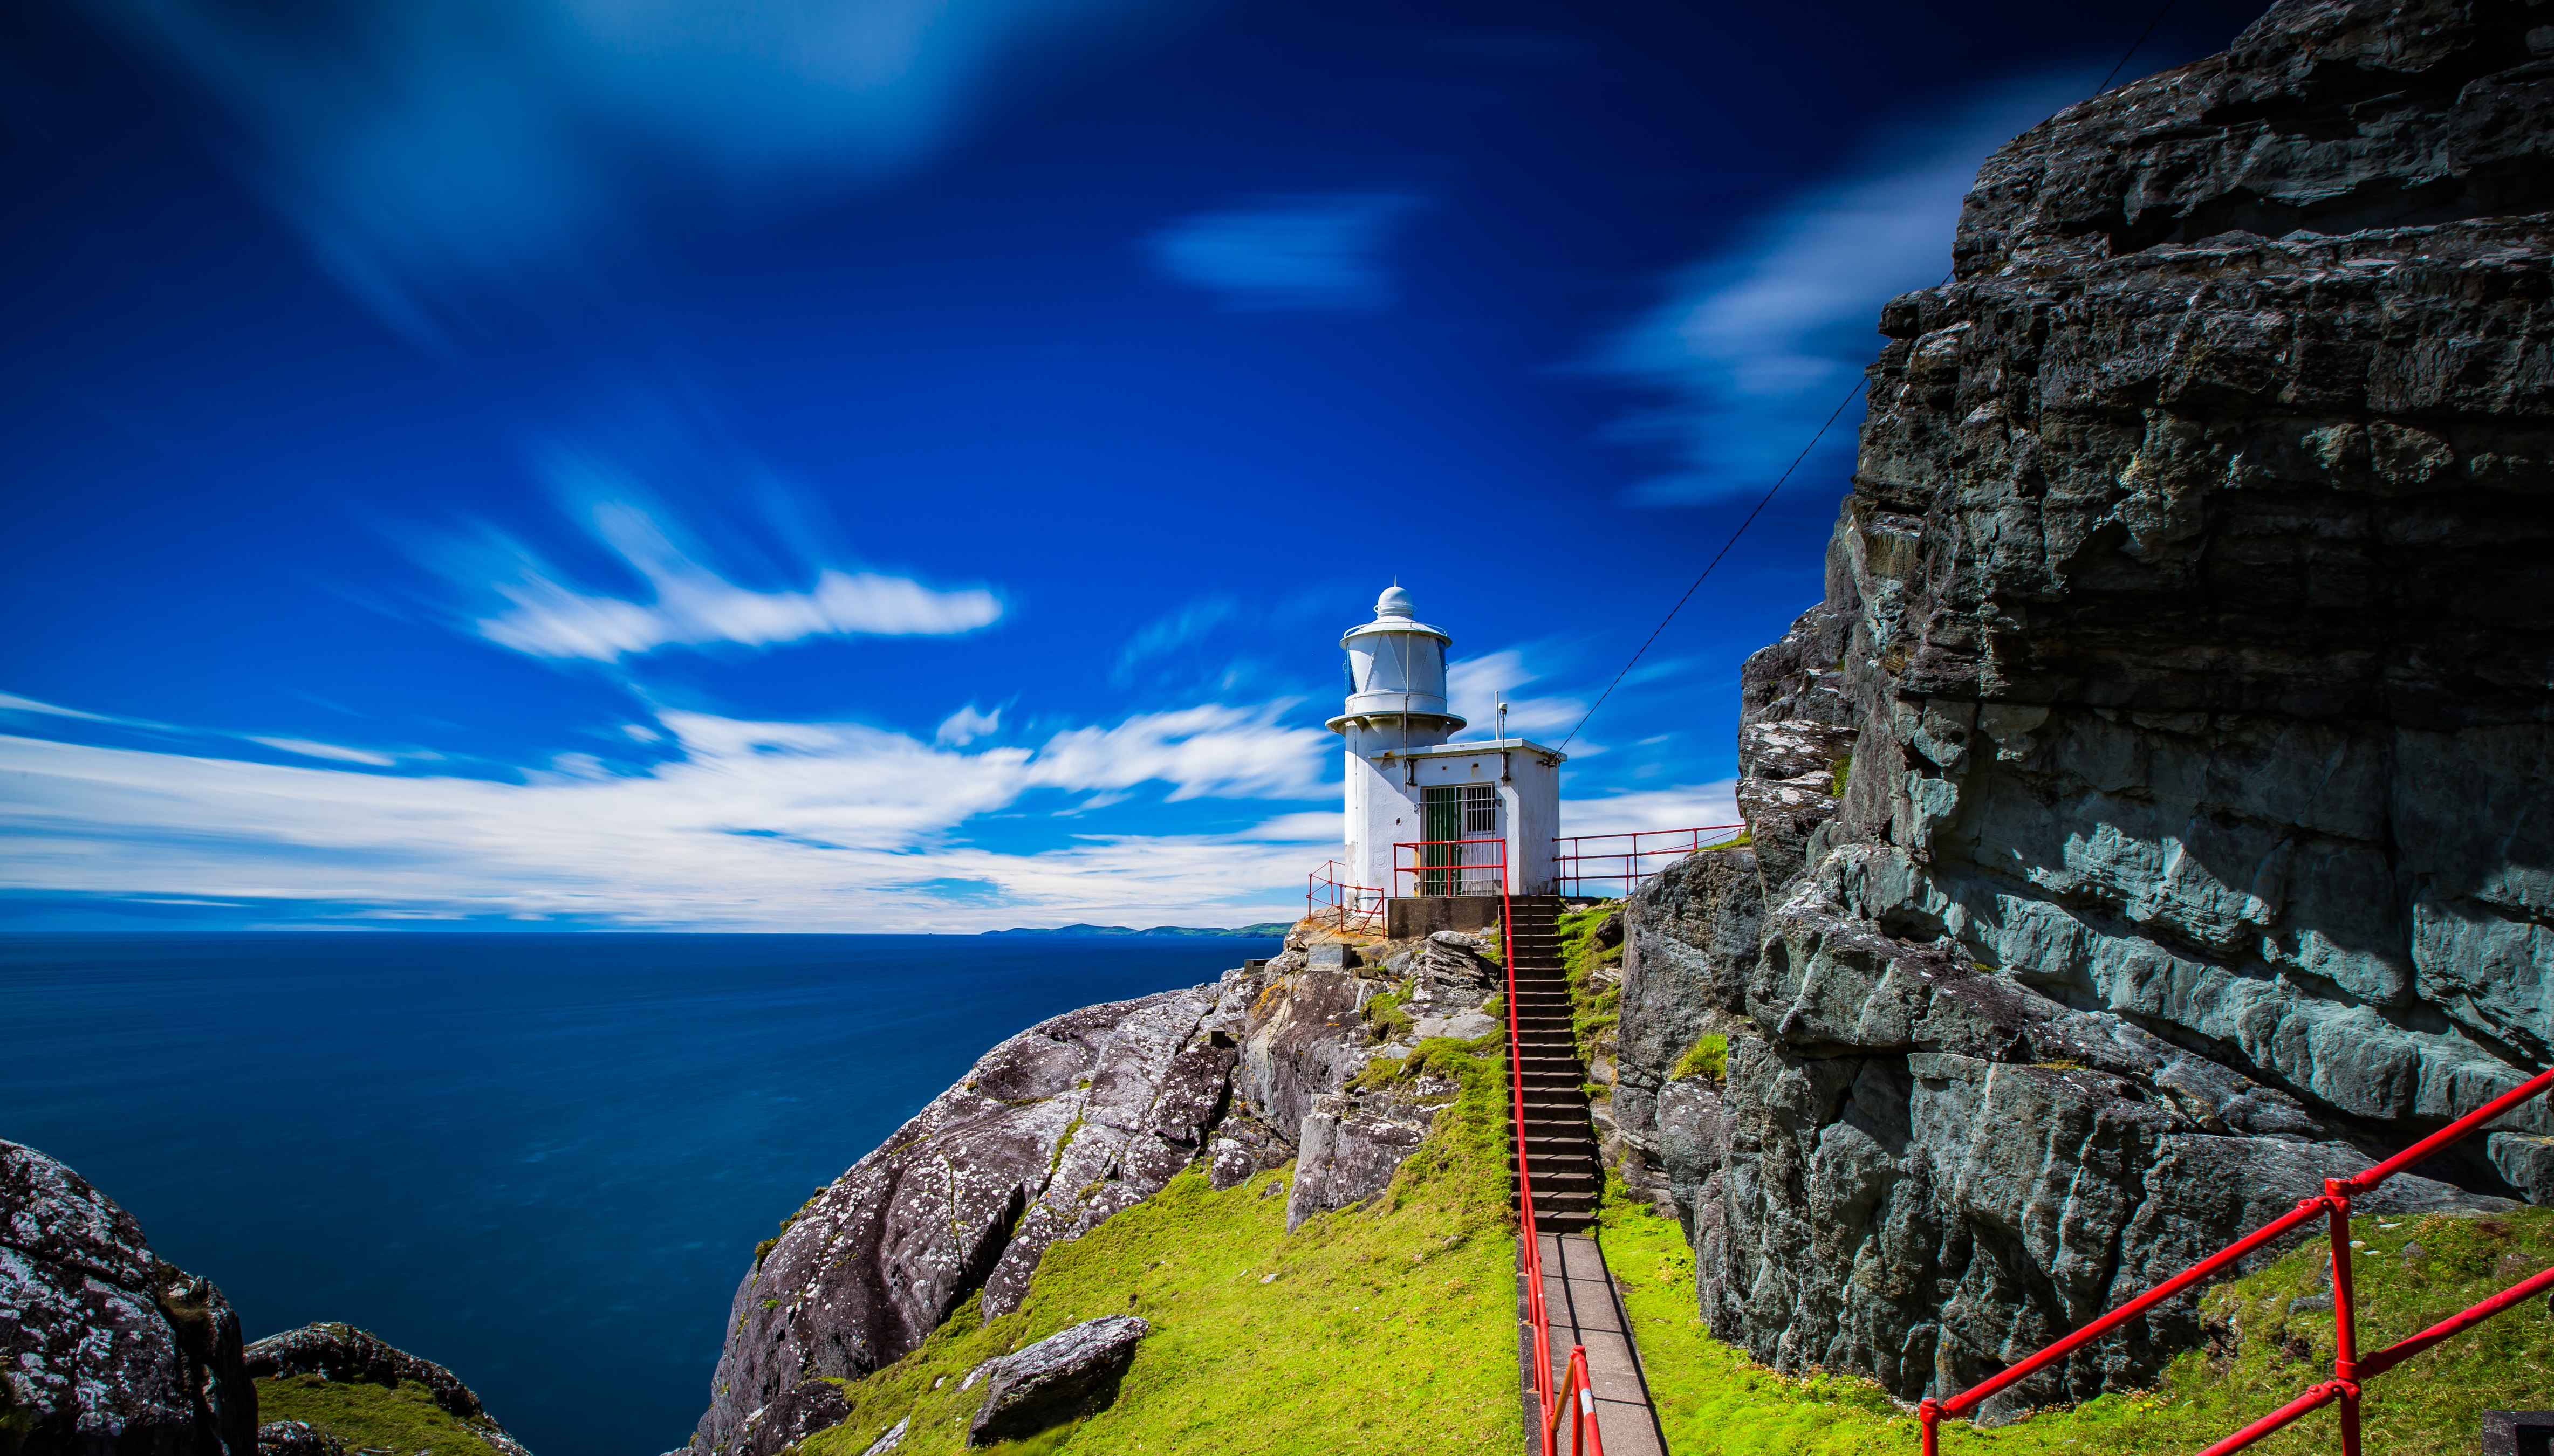 Sheep's Head Lighthouse on Tooreen Island in Ireland 4k ...